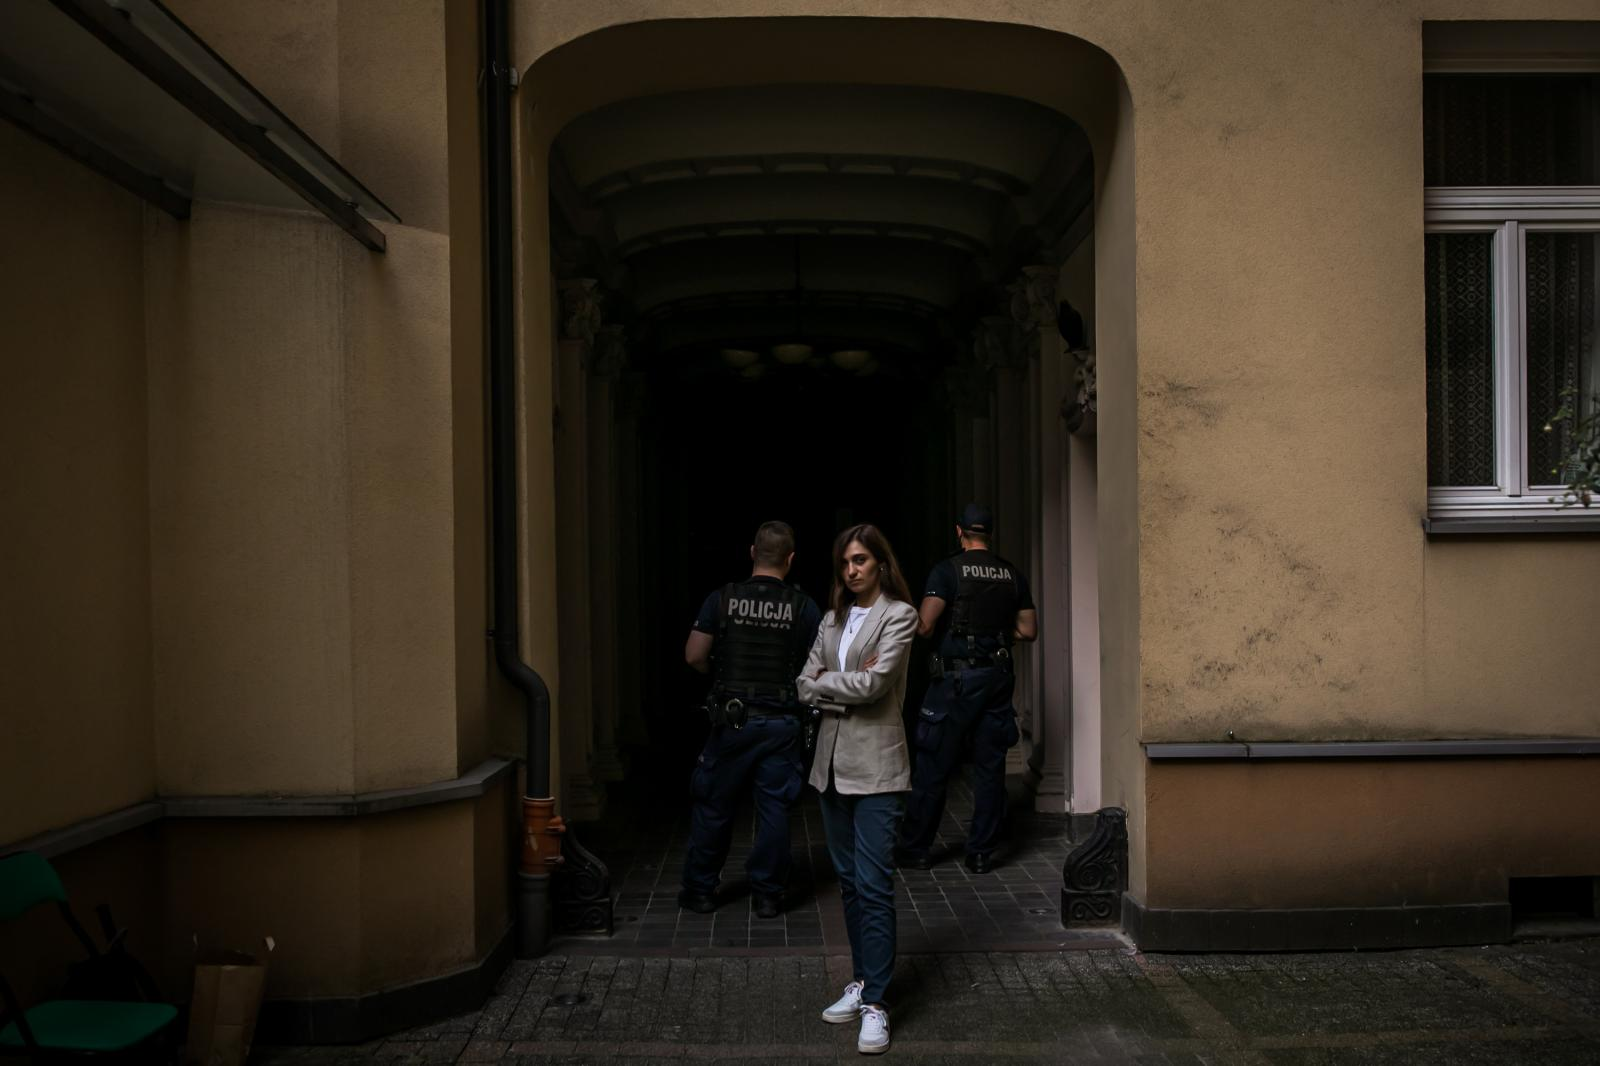 Photography image - Loading 13_Belarus_story_Anna_Liminowicz-62.jpg